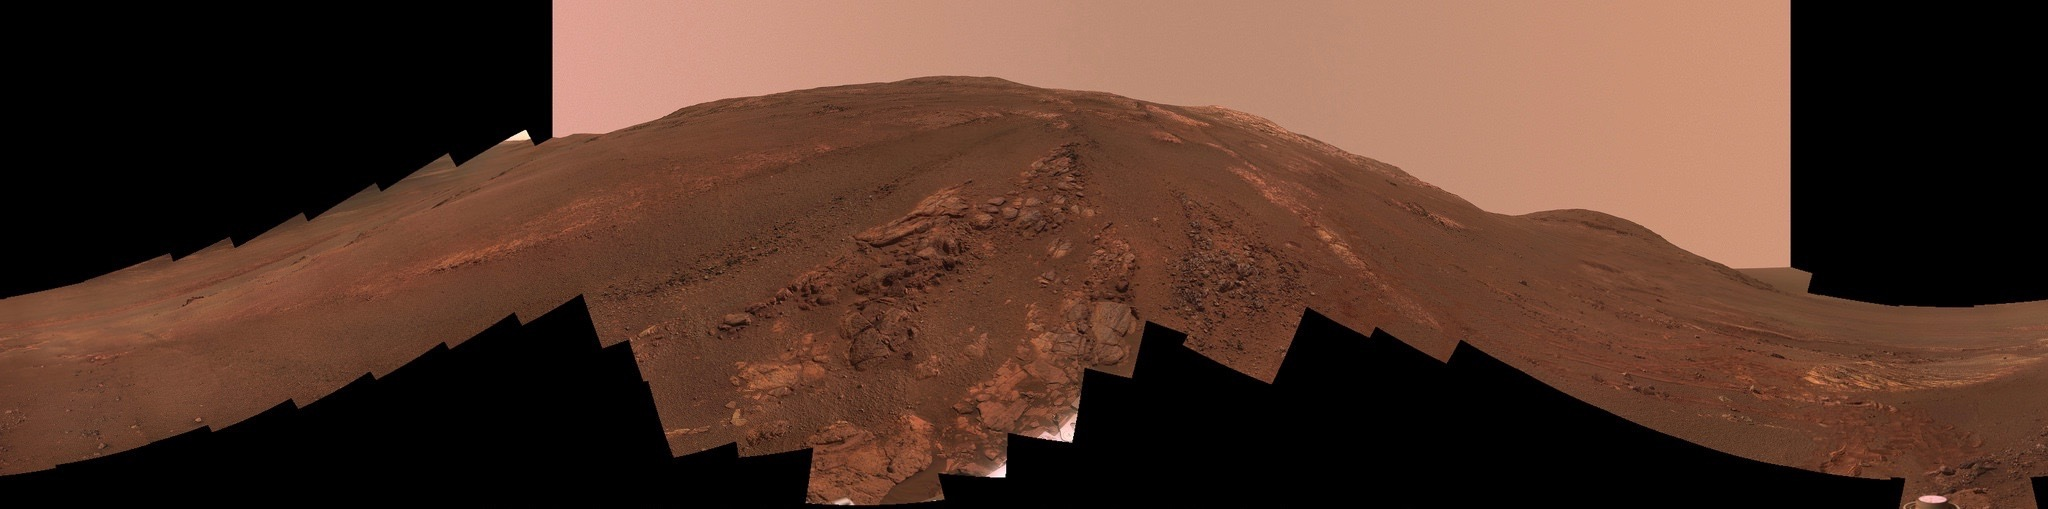 mars rover recovery - photo #42